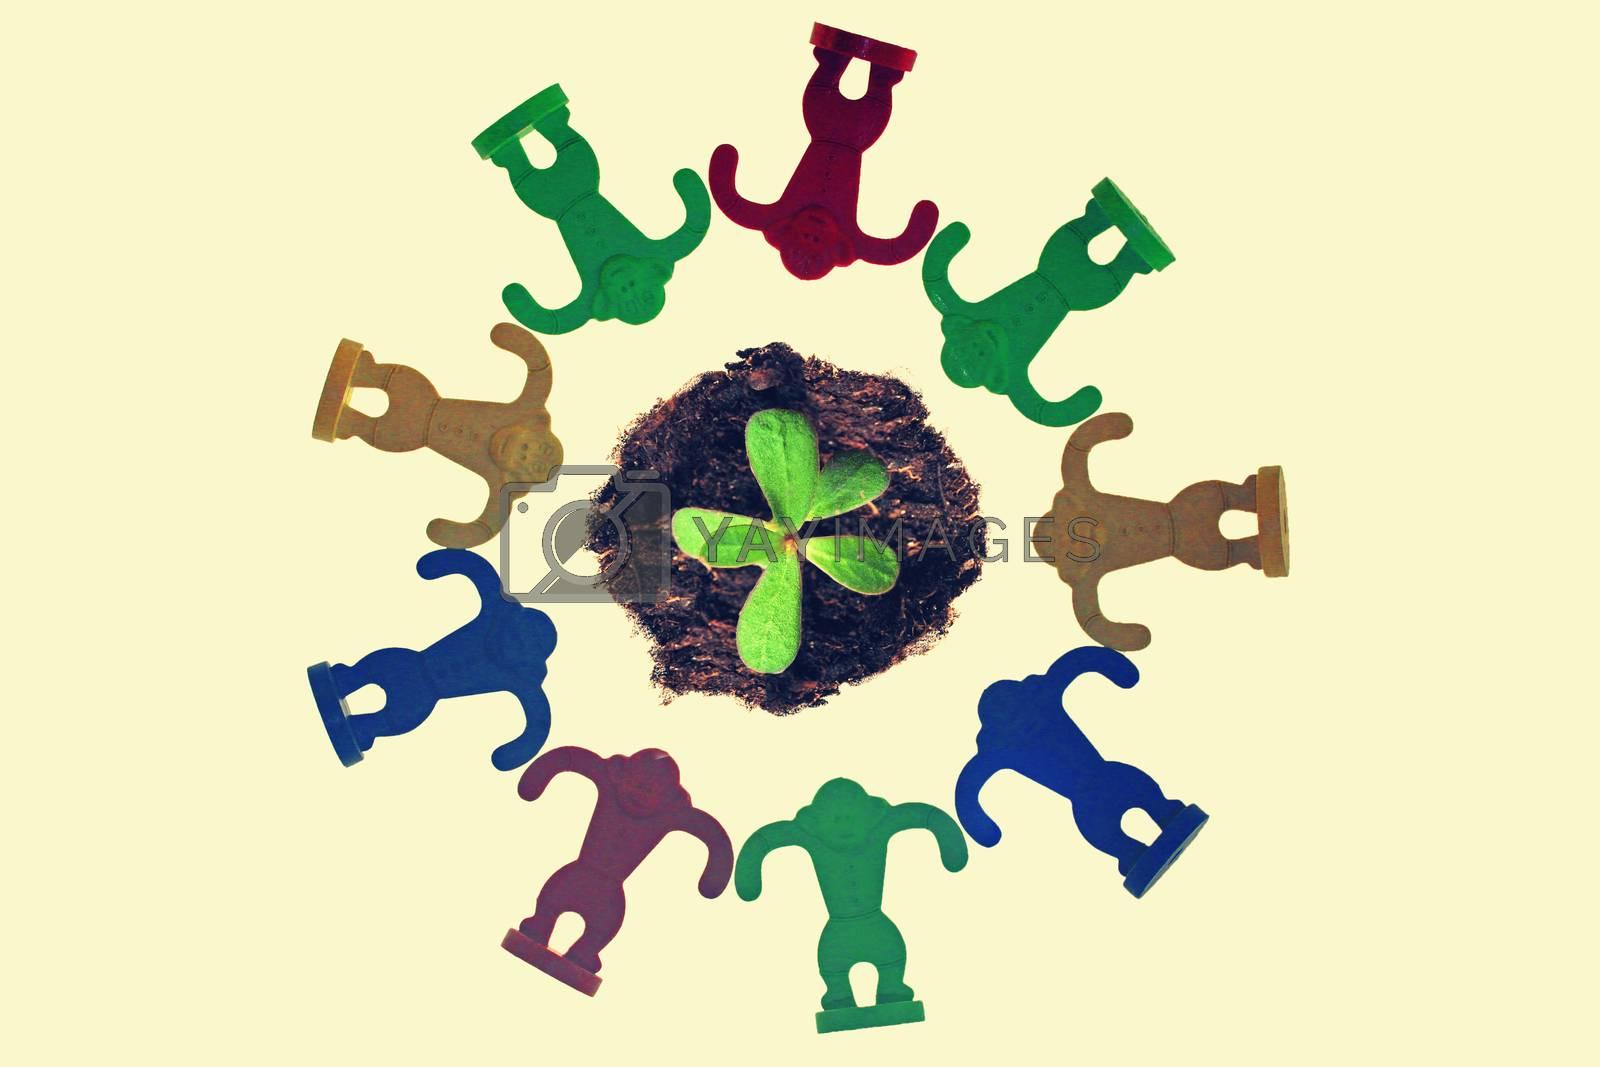 Concept of environmental protection